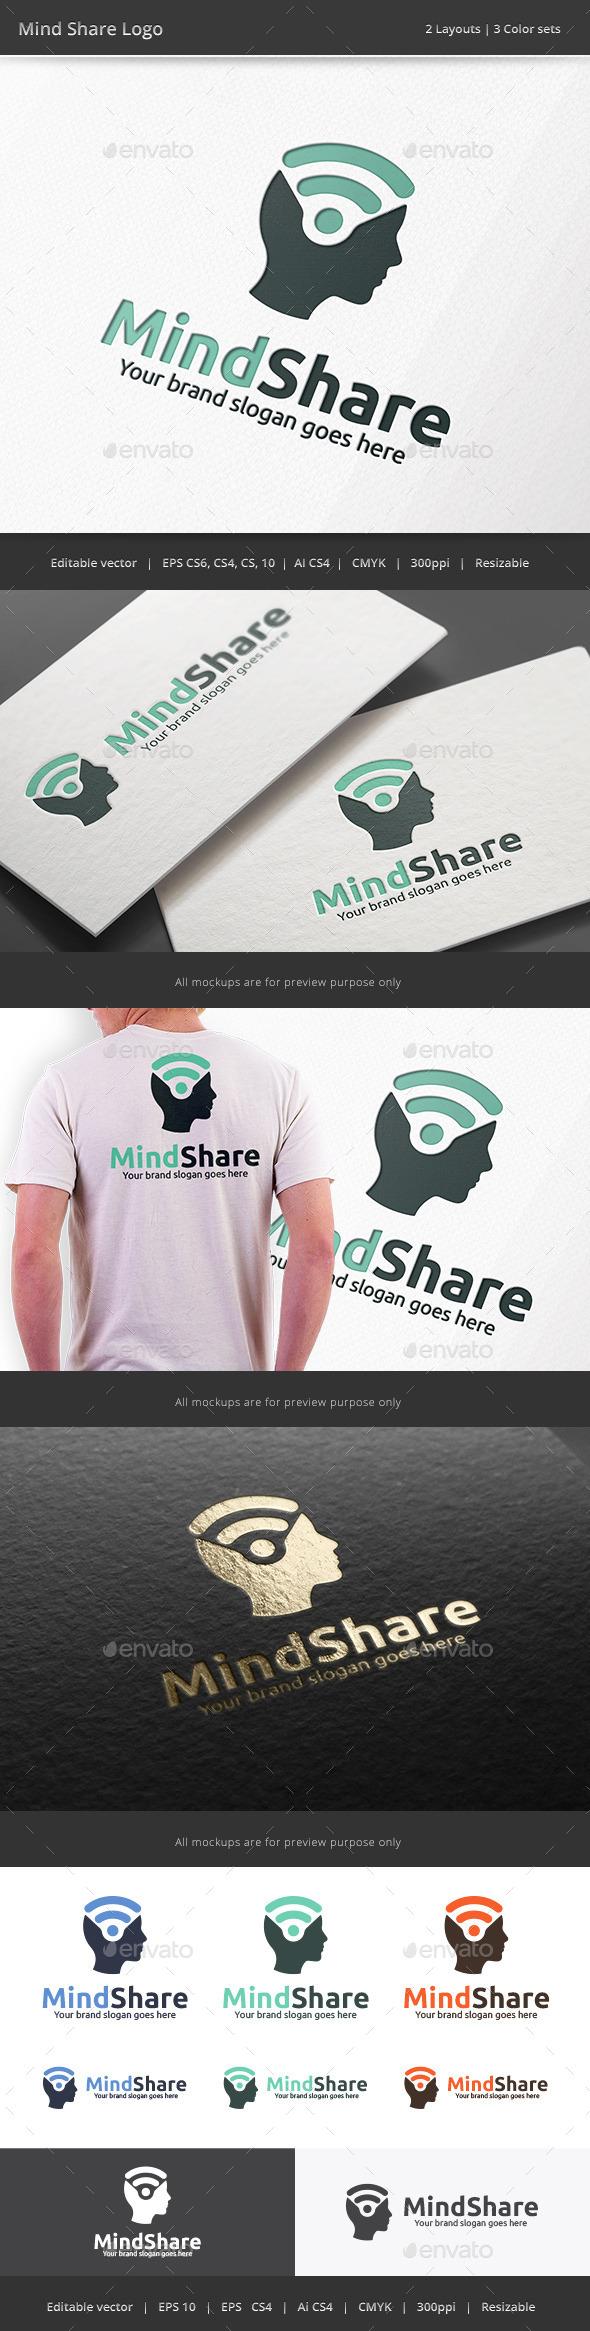 Mind Share Head Logo - Vector Abstract